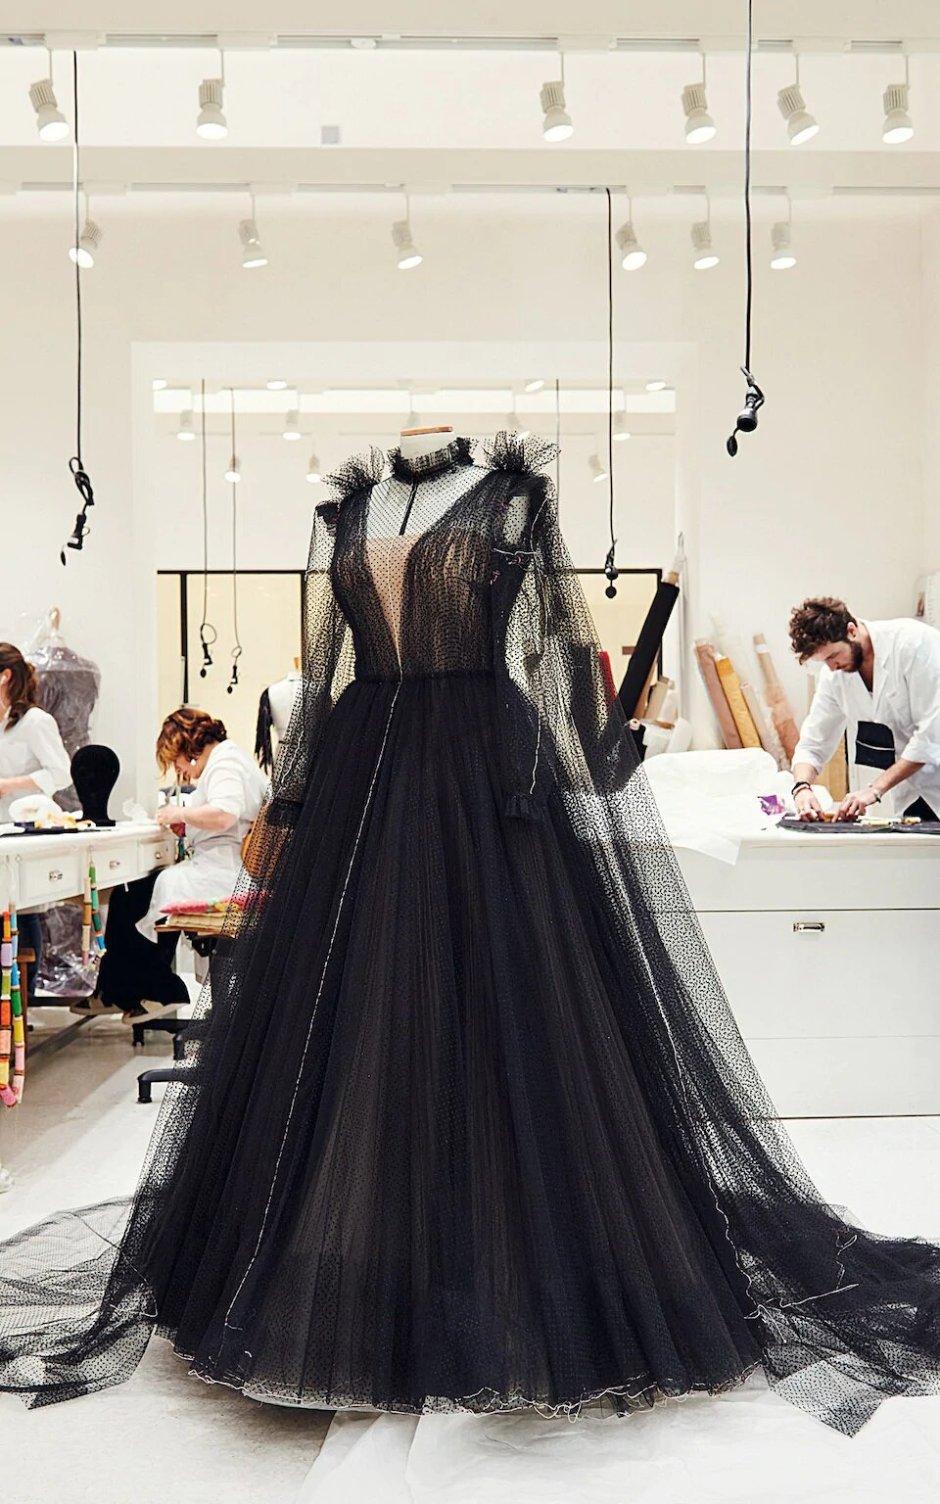 Black-gown_trans_NvBQzQNjv4Bqs46RRR_iZggMNT5UsqpNYfwxqoGSclDNgMMen3jJG40